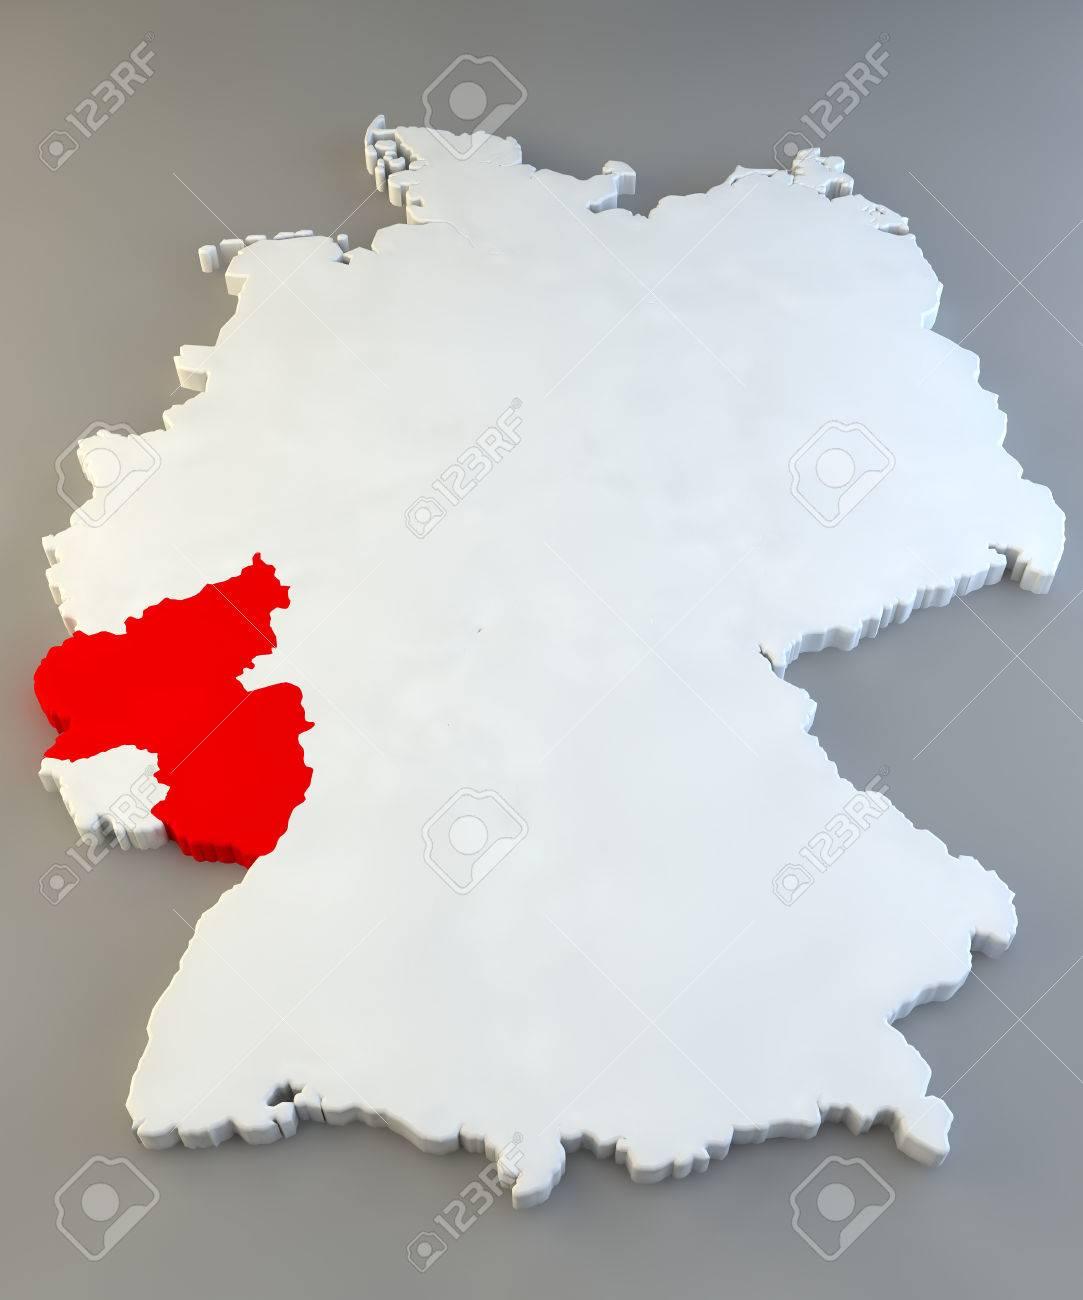 Germany Region Map Rheinland Pfalz Stock Photo Picture And Royalty